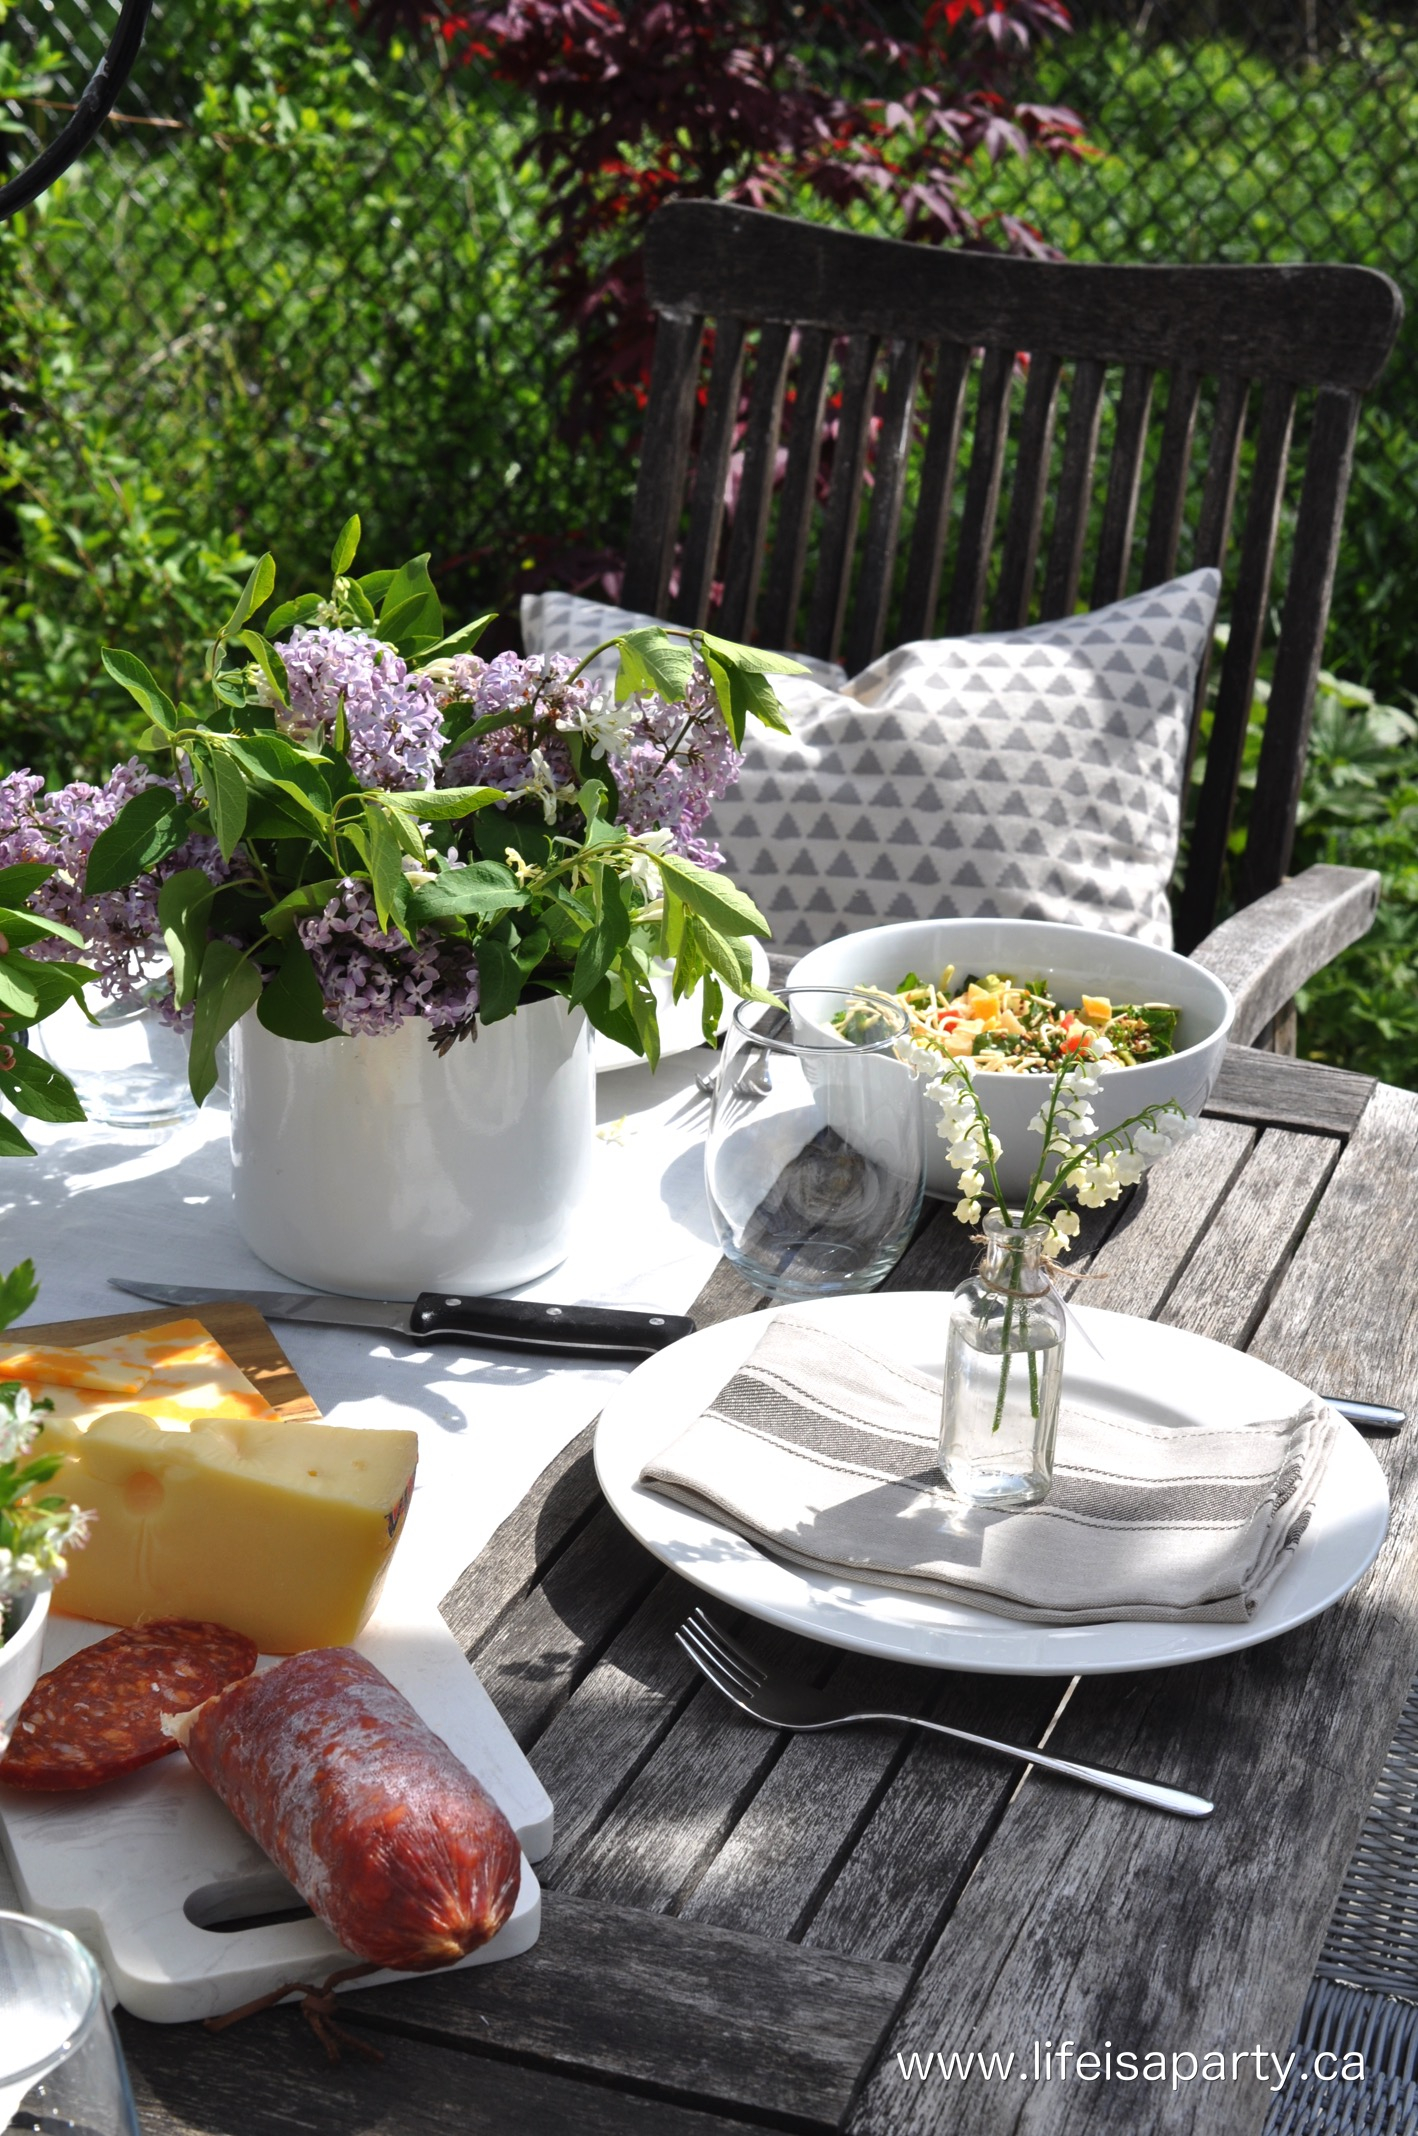 24.SIMPHOME.COM A summer backyard picnic ideas